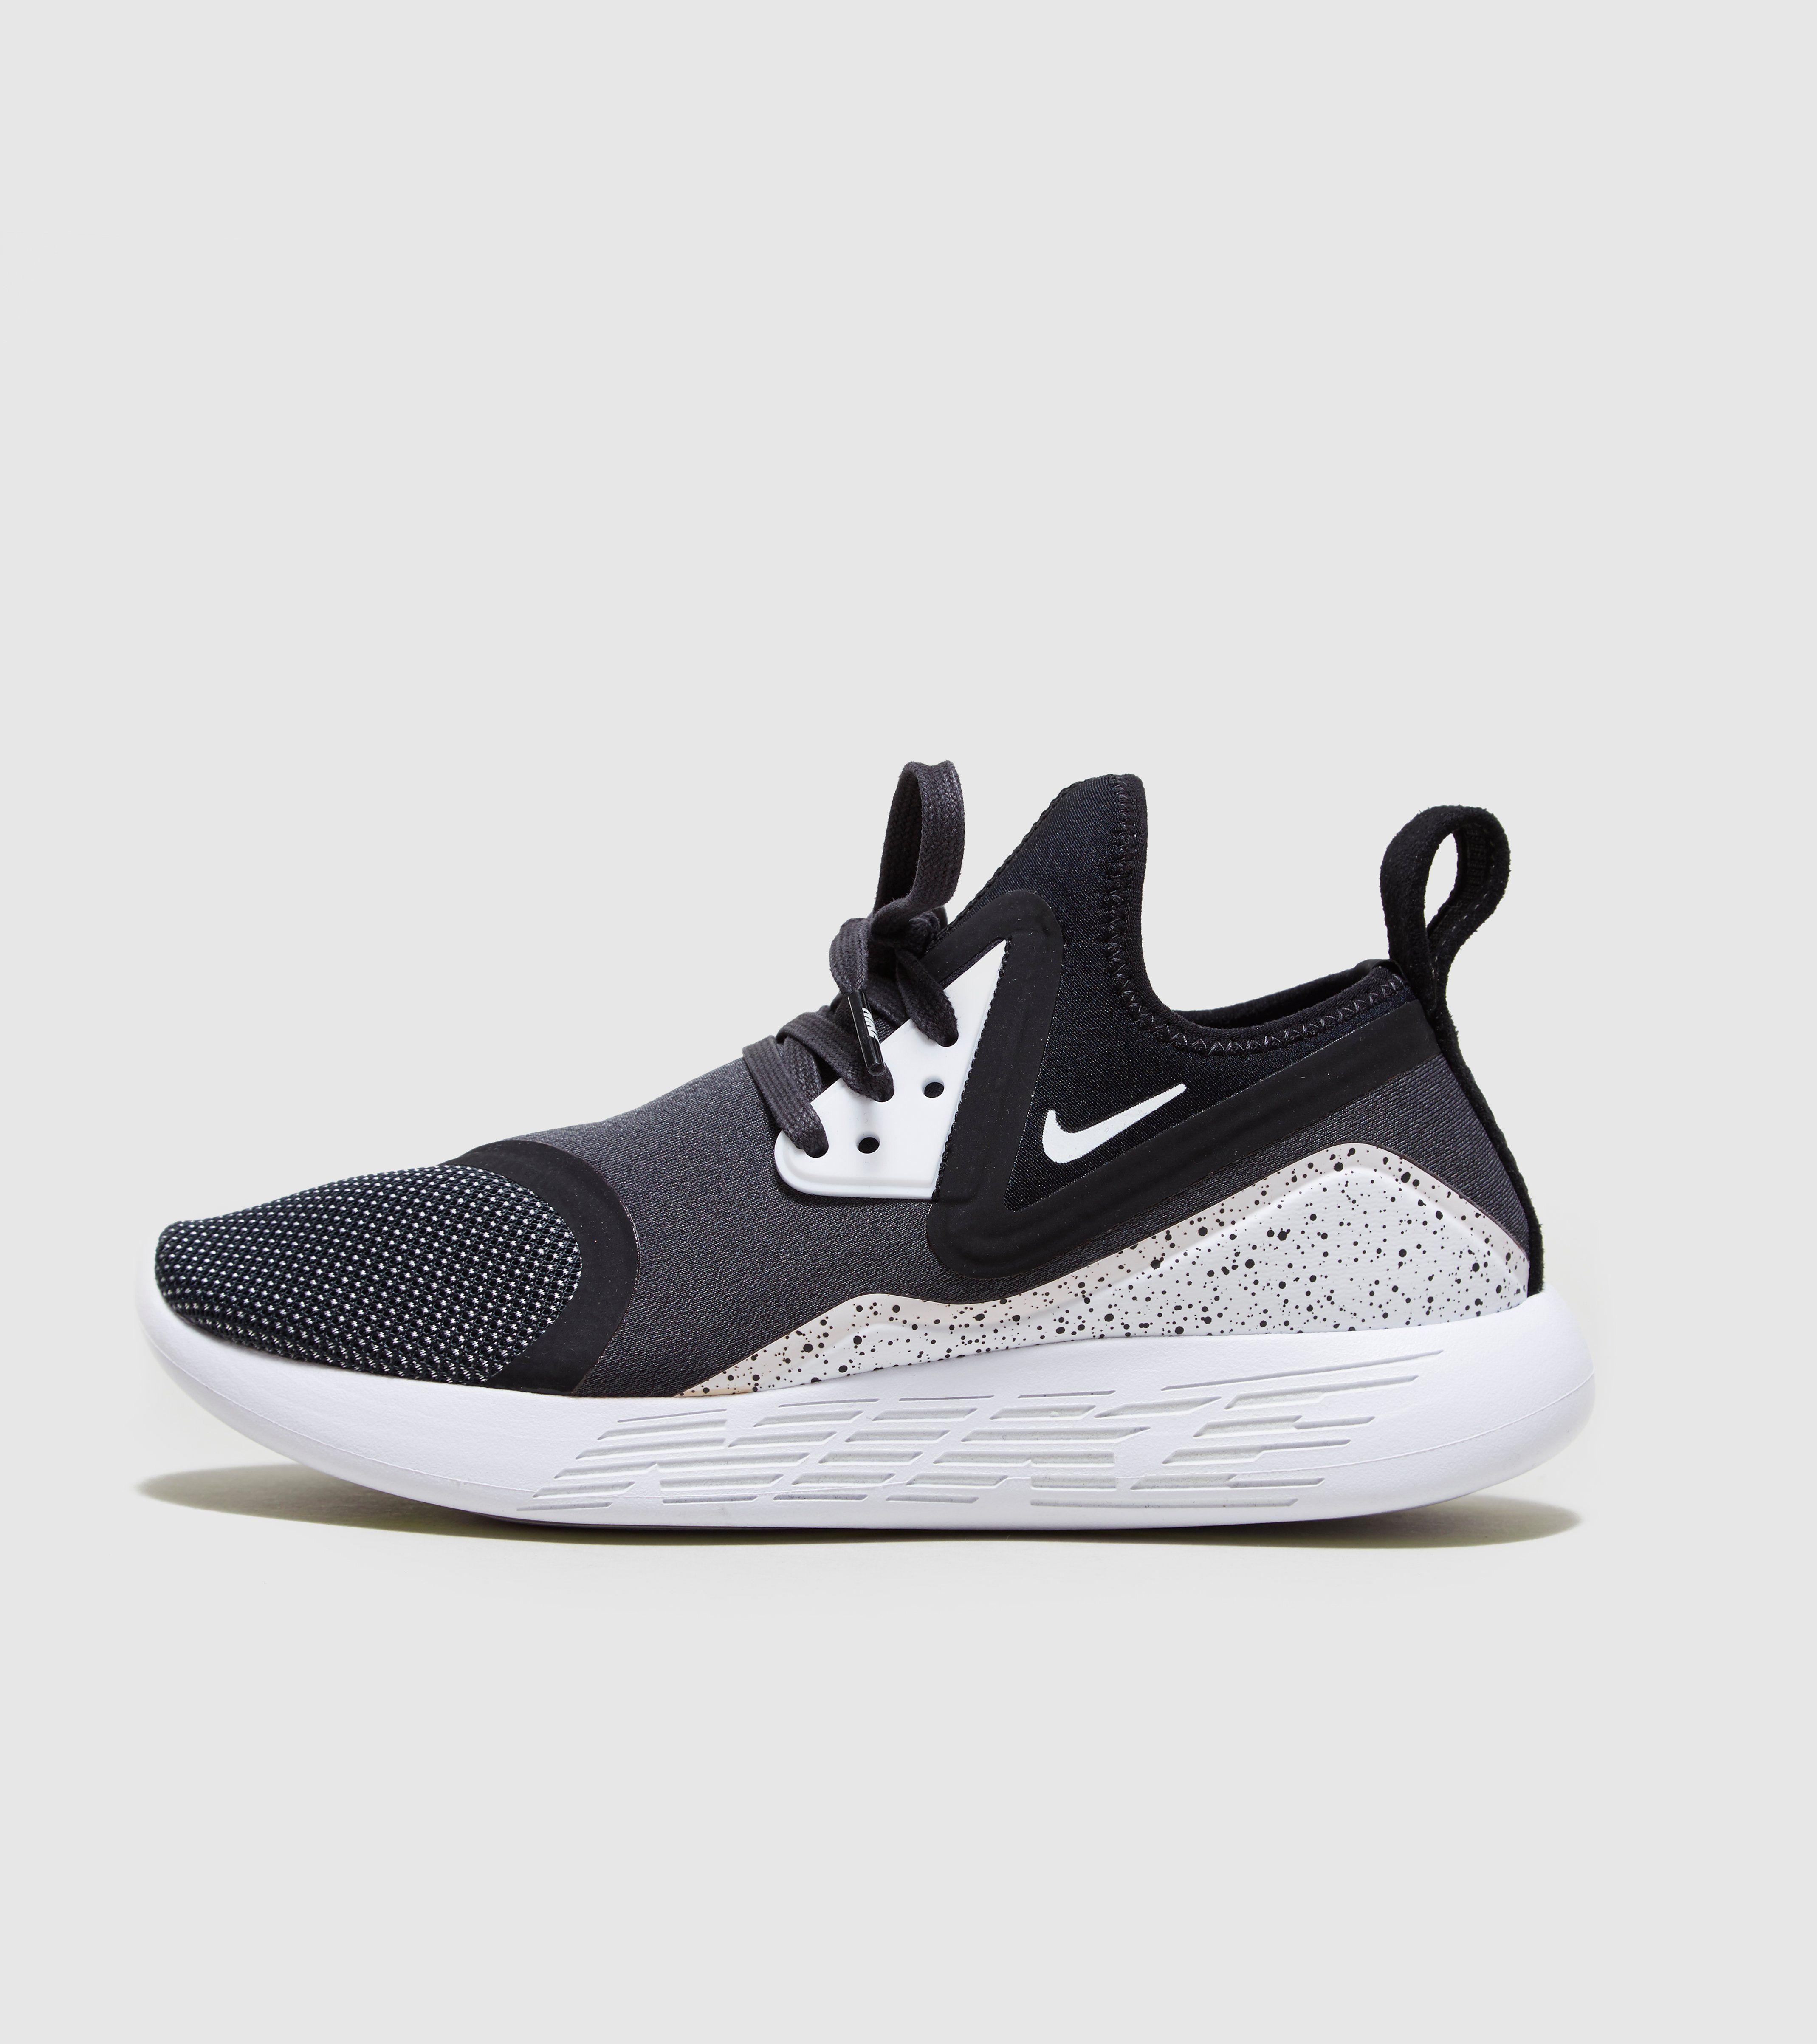 Nike Lunarcharge Women's